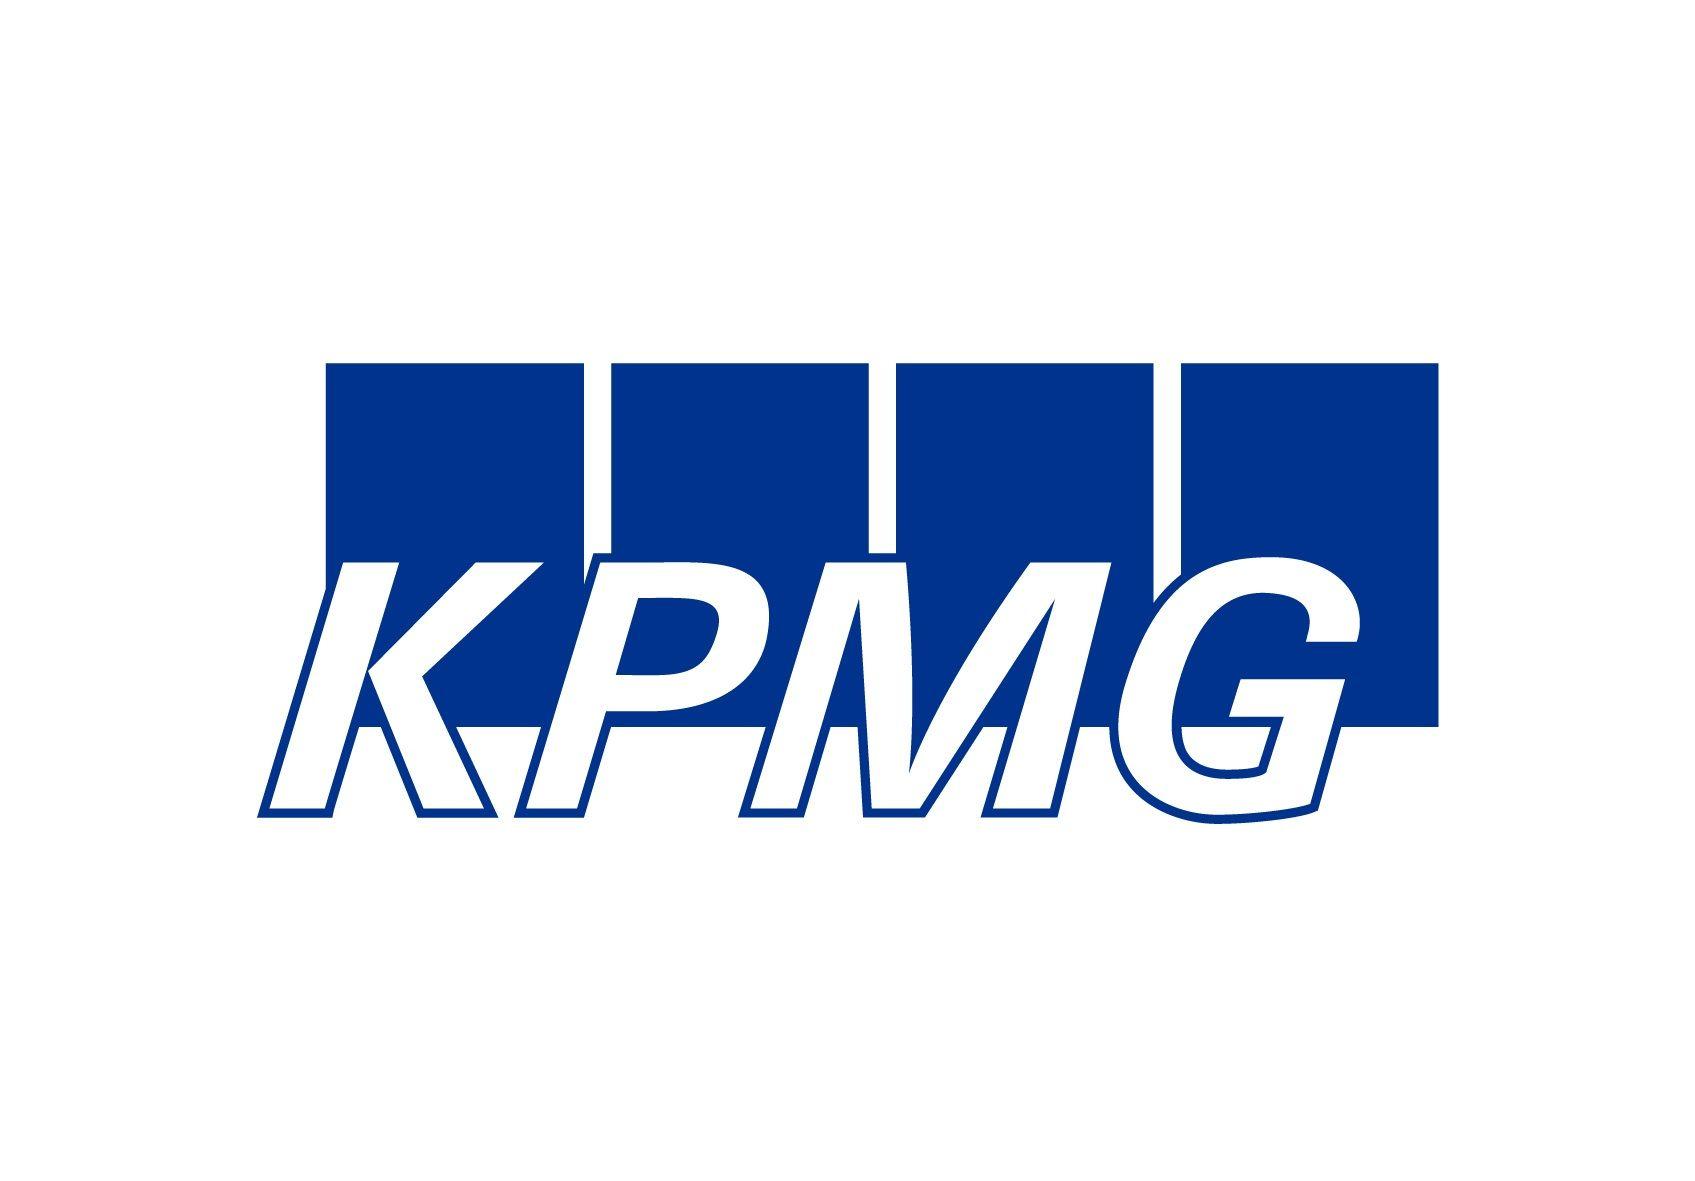 Kpmg Logos Student Portal Business Management